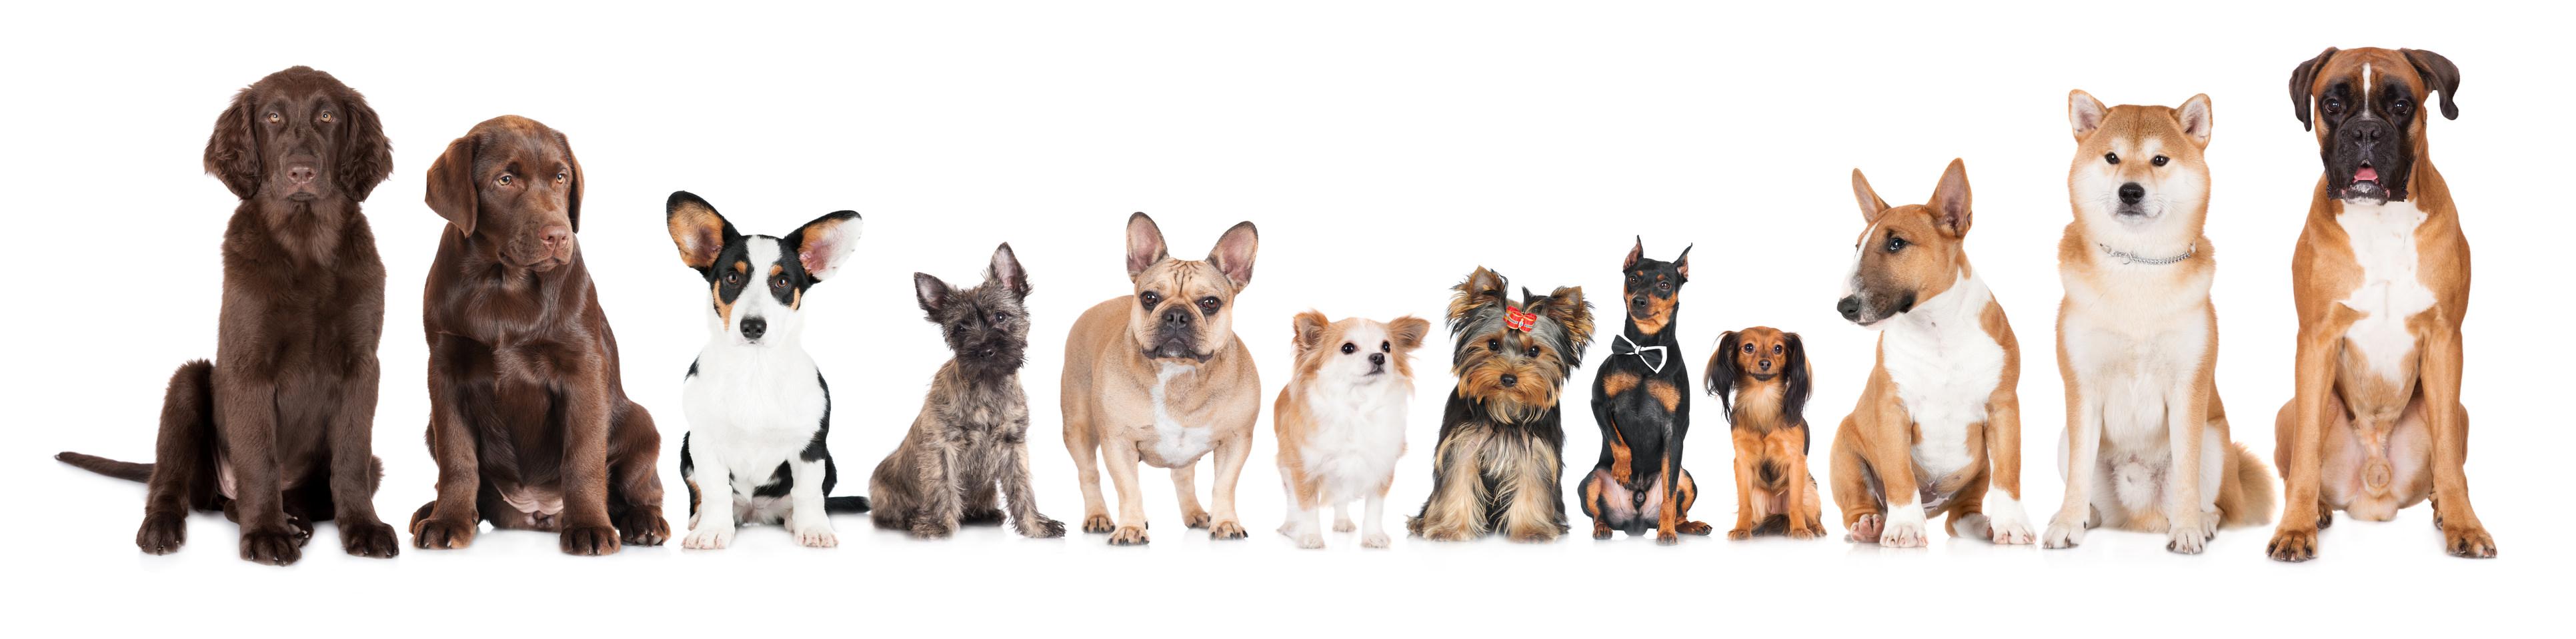 Best Big Dog Breeds For Families